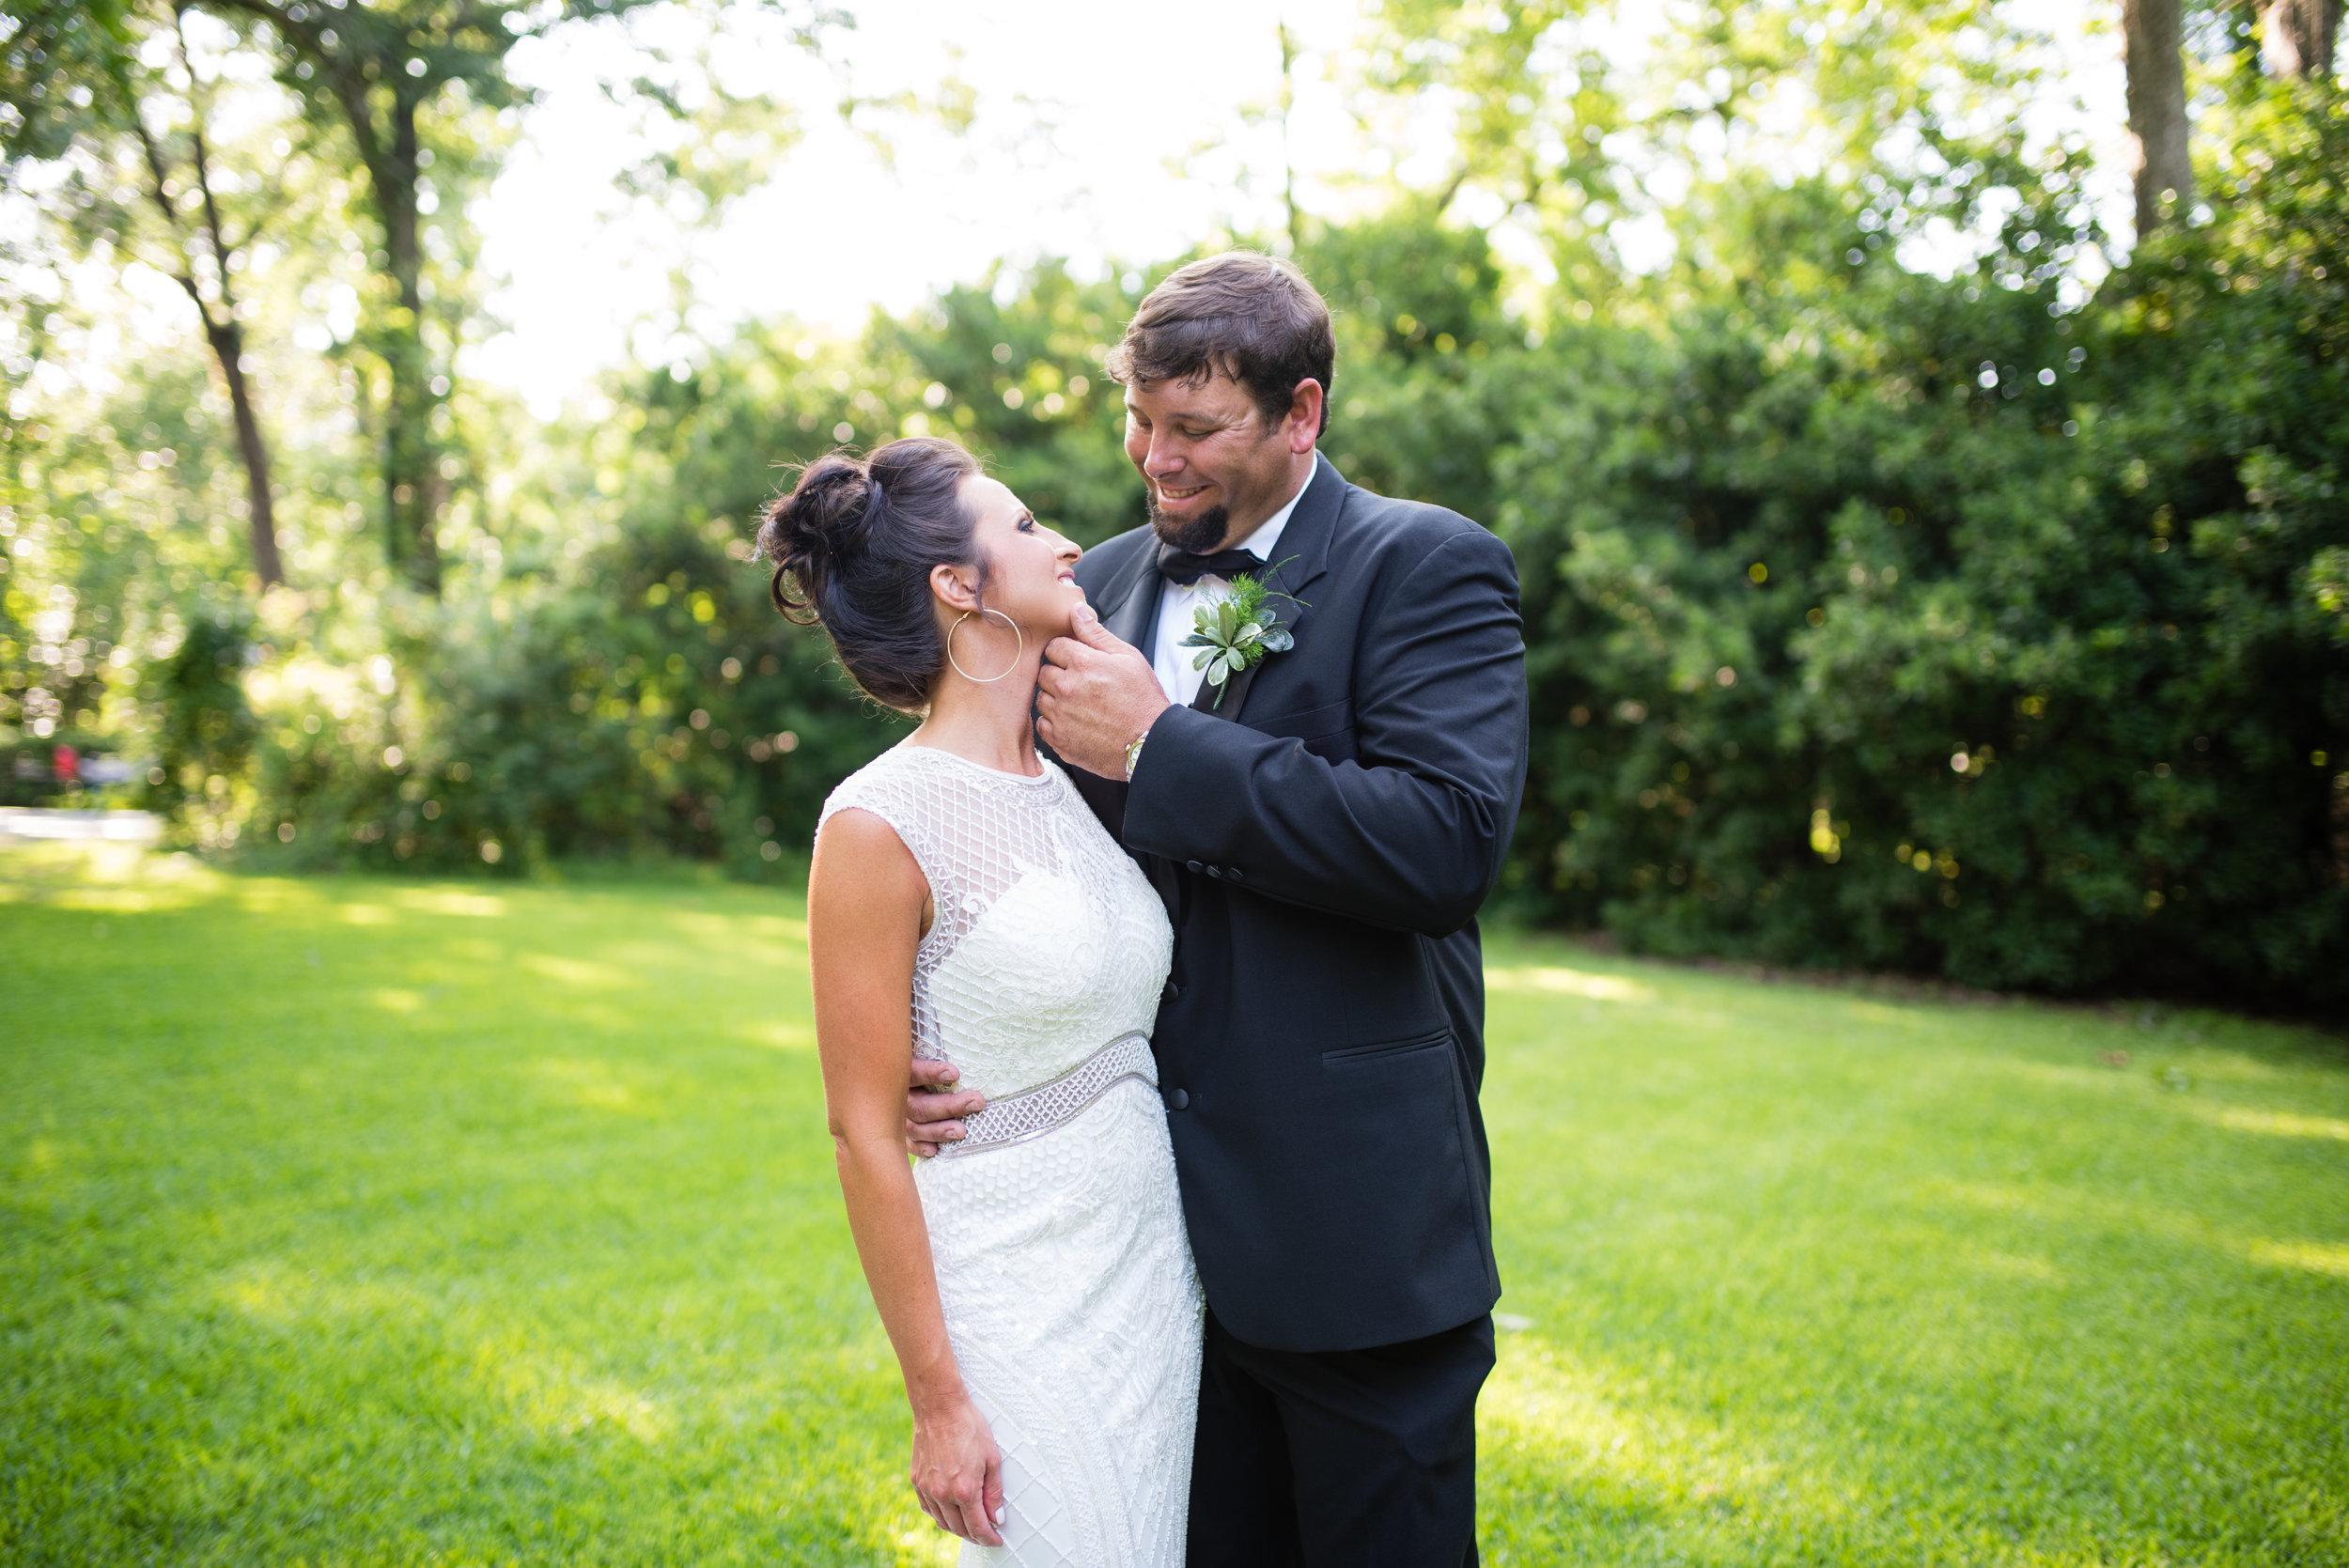 The Wedding Couple.3 - Cierra Smith Photography.jpg